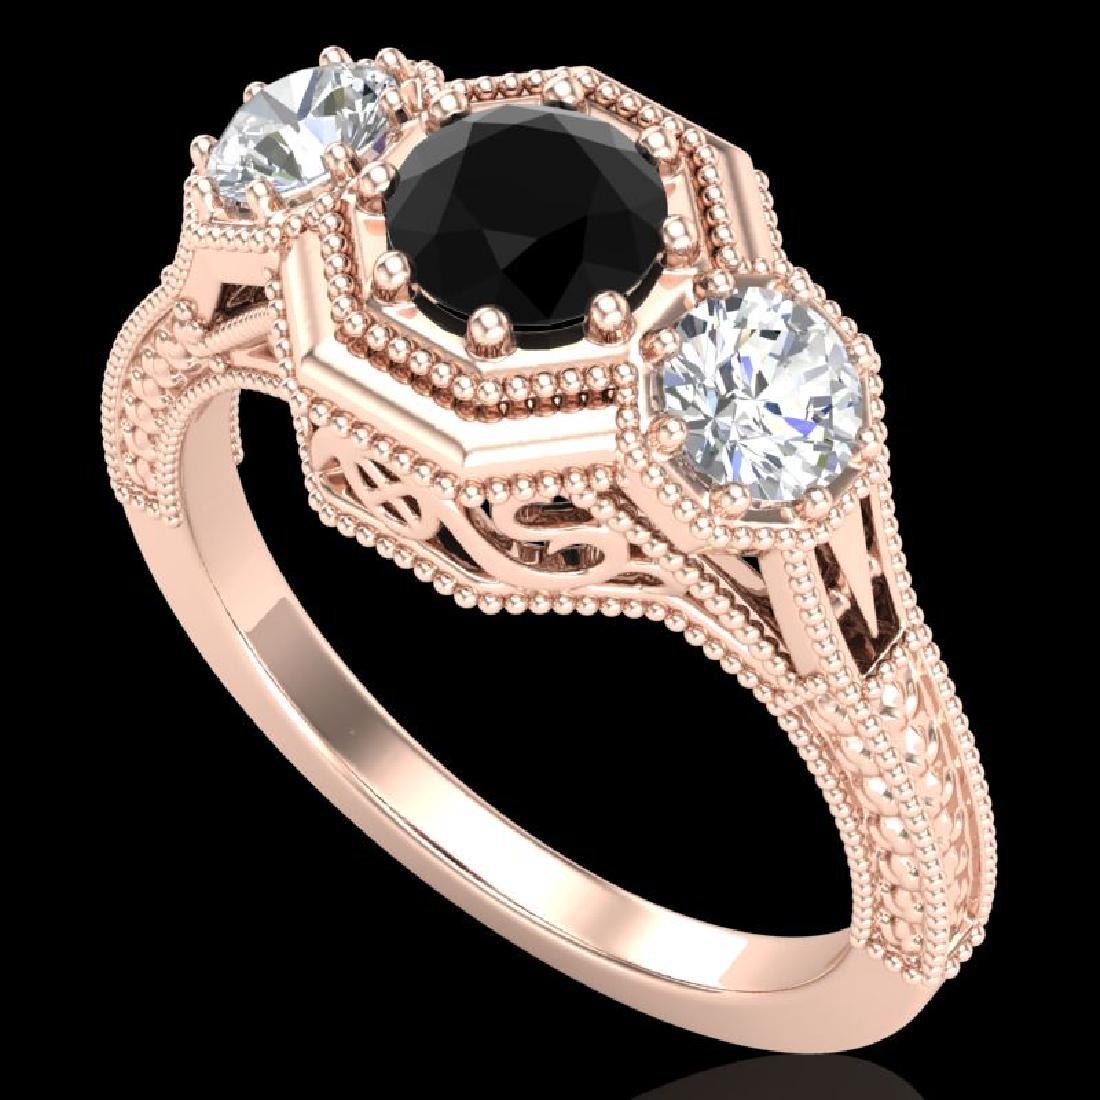 1.05 CTW Fancy Black Diamond Solitaire Art Deco 3 Stone